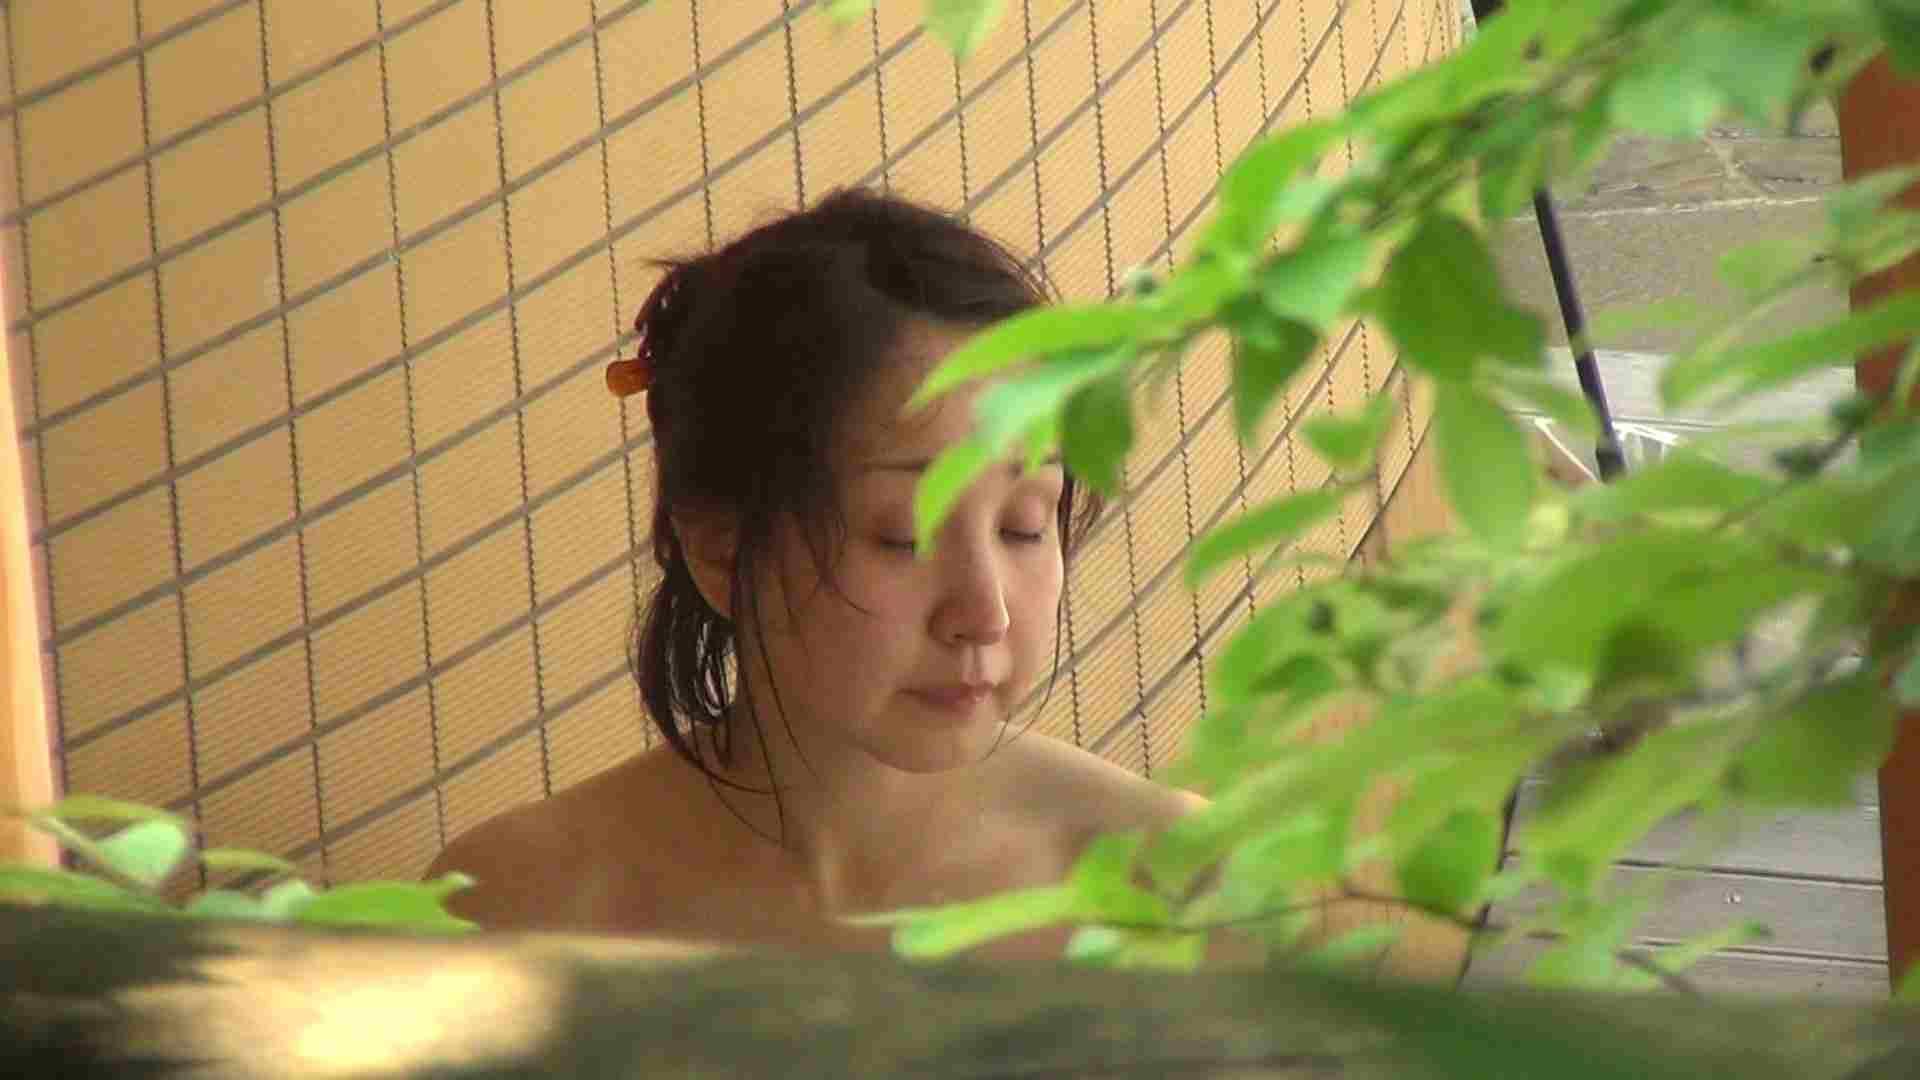 Aquaな露天風呂Vol.308 盗撮映像  75Pix 14